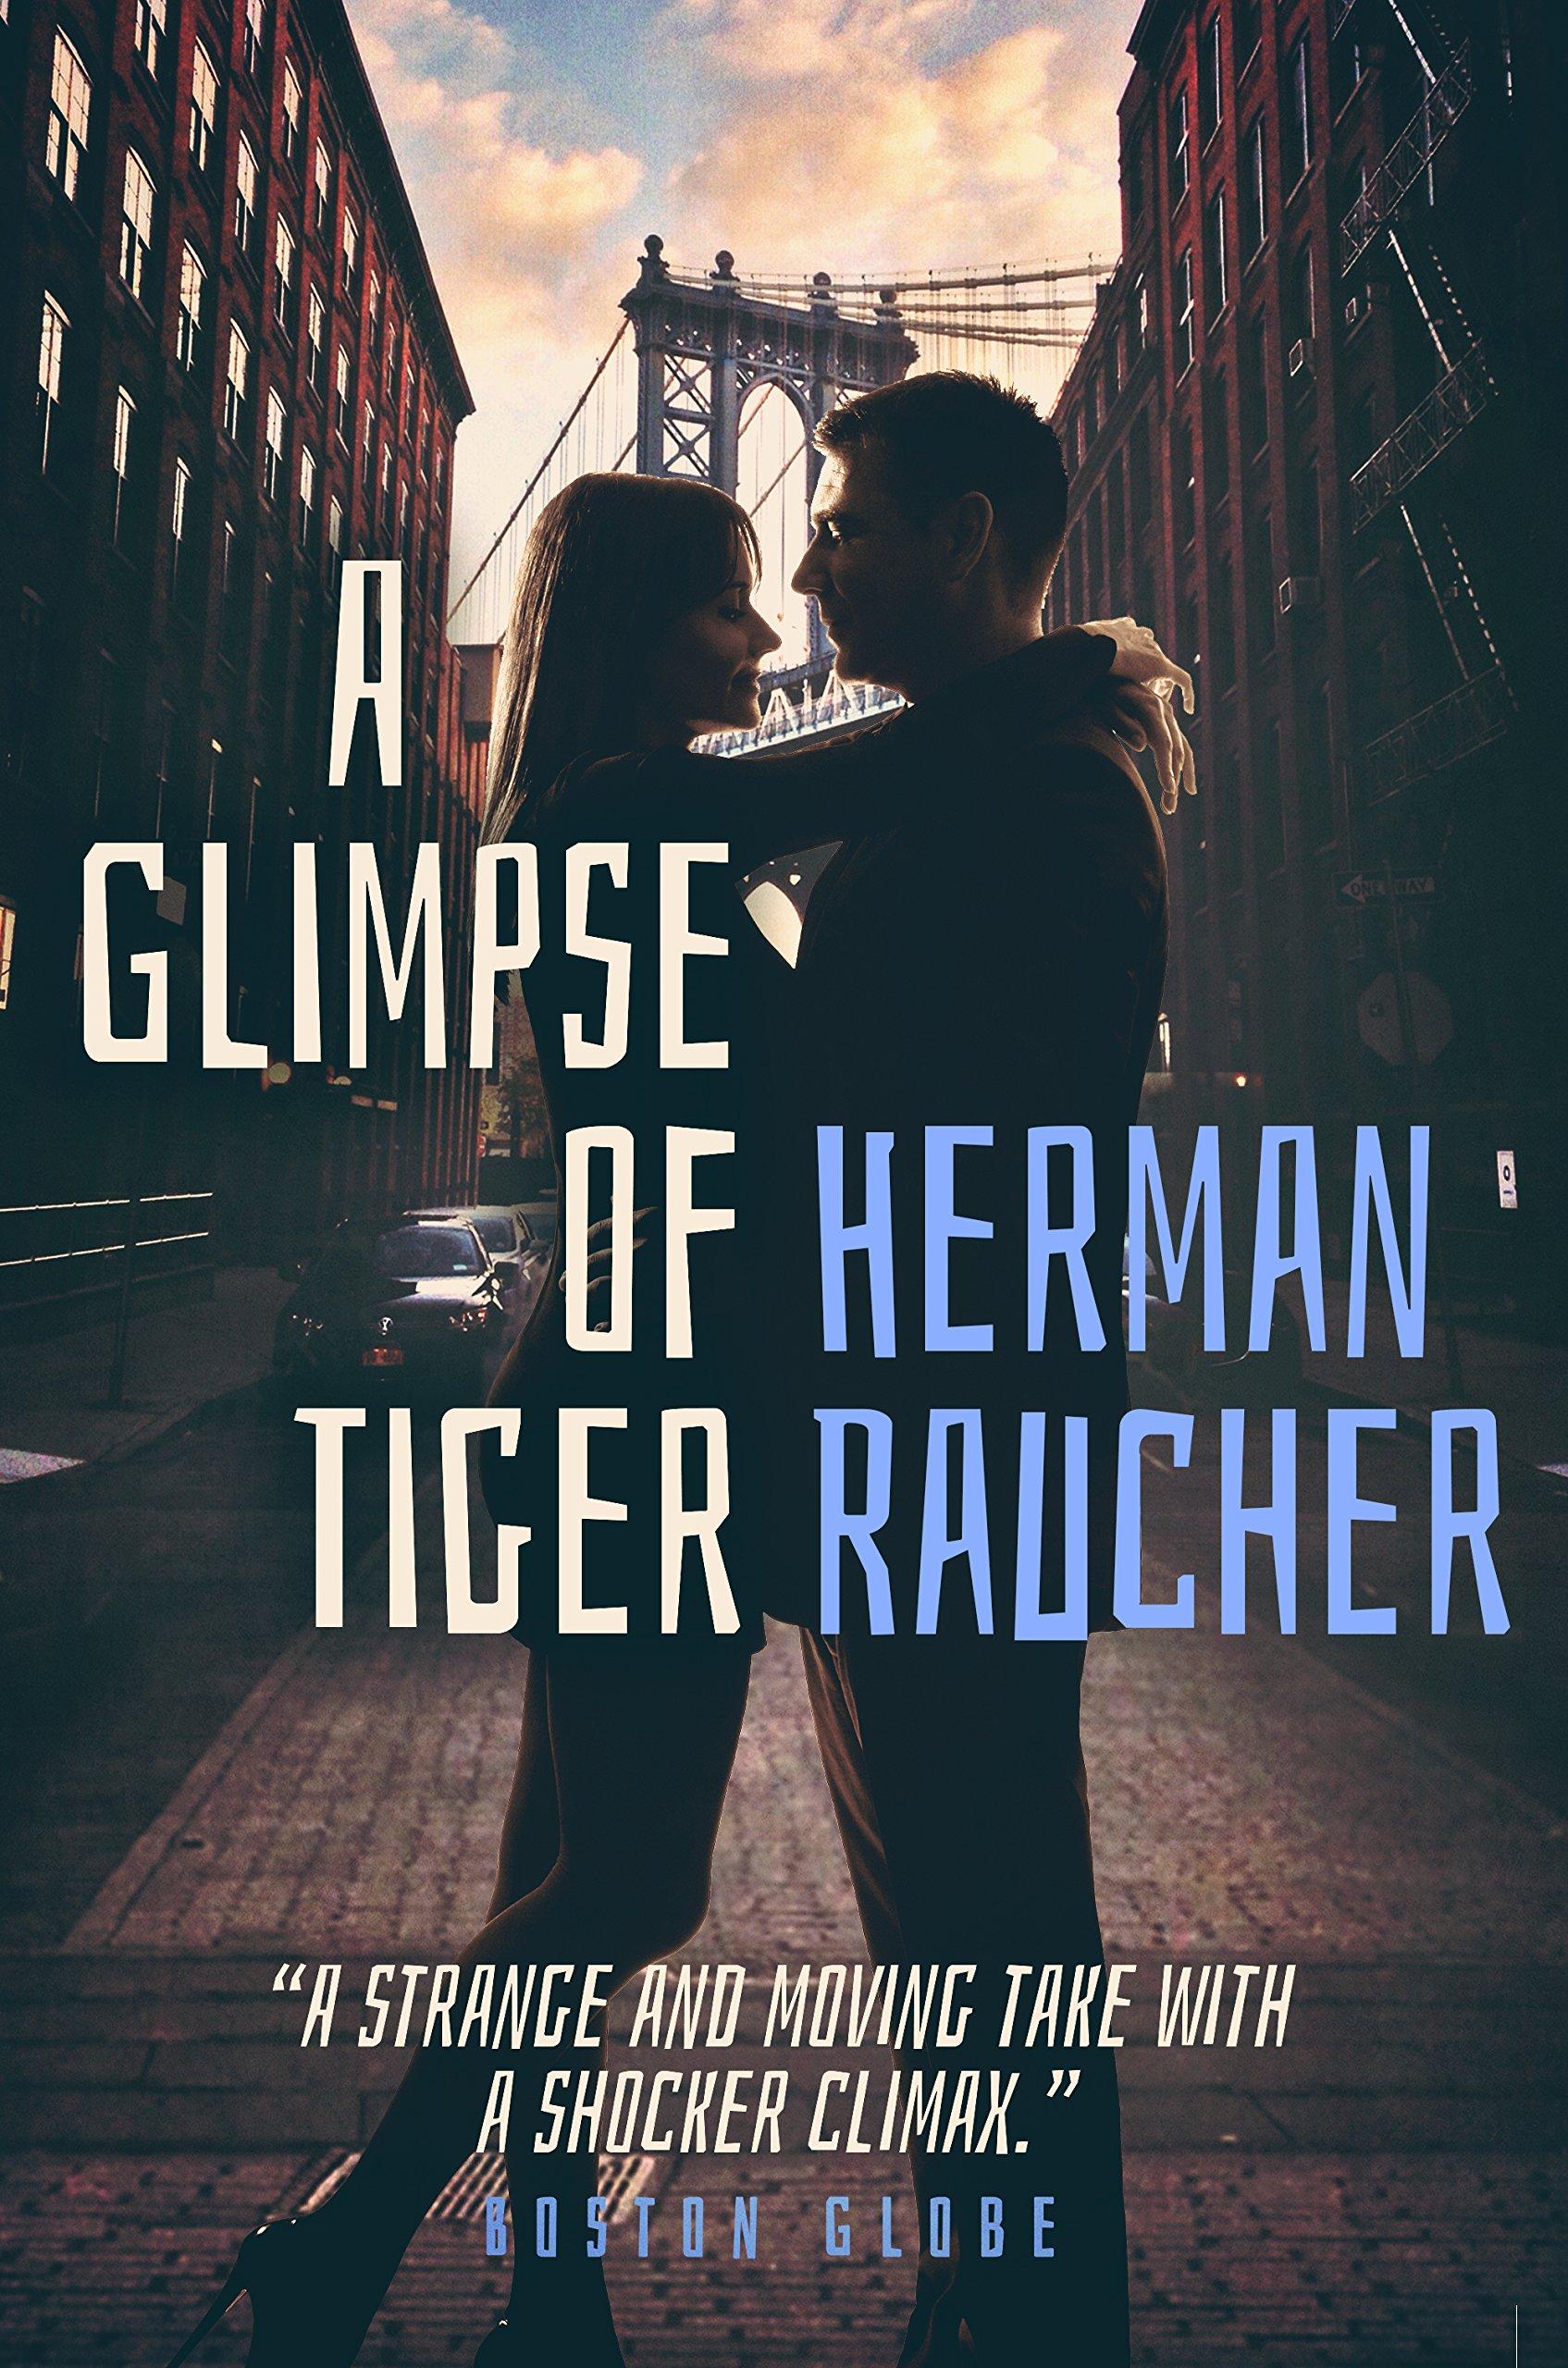 A Glimpse of Tiger: Amazon.es: Herman Raucher: Libros en idiomas extranjeros